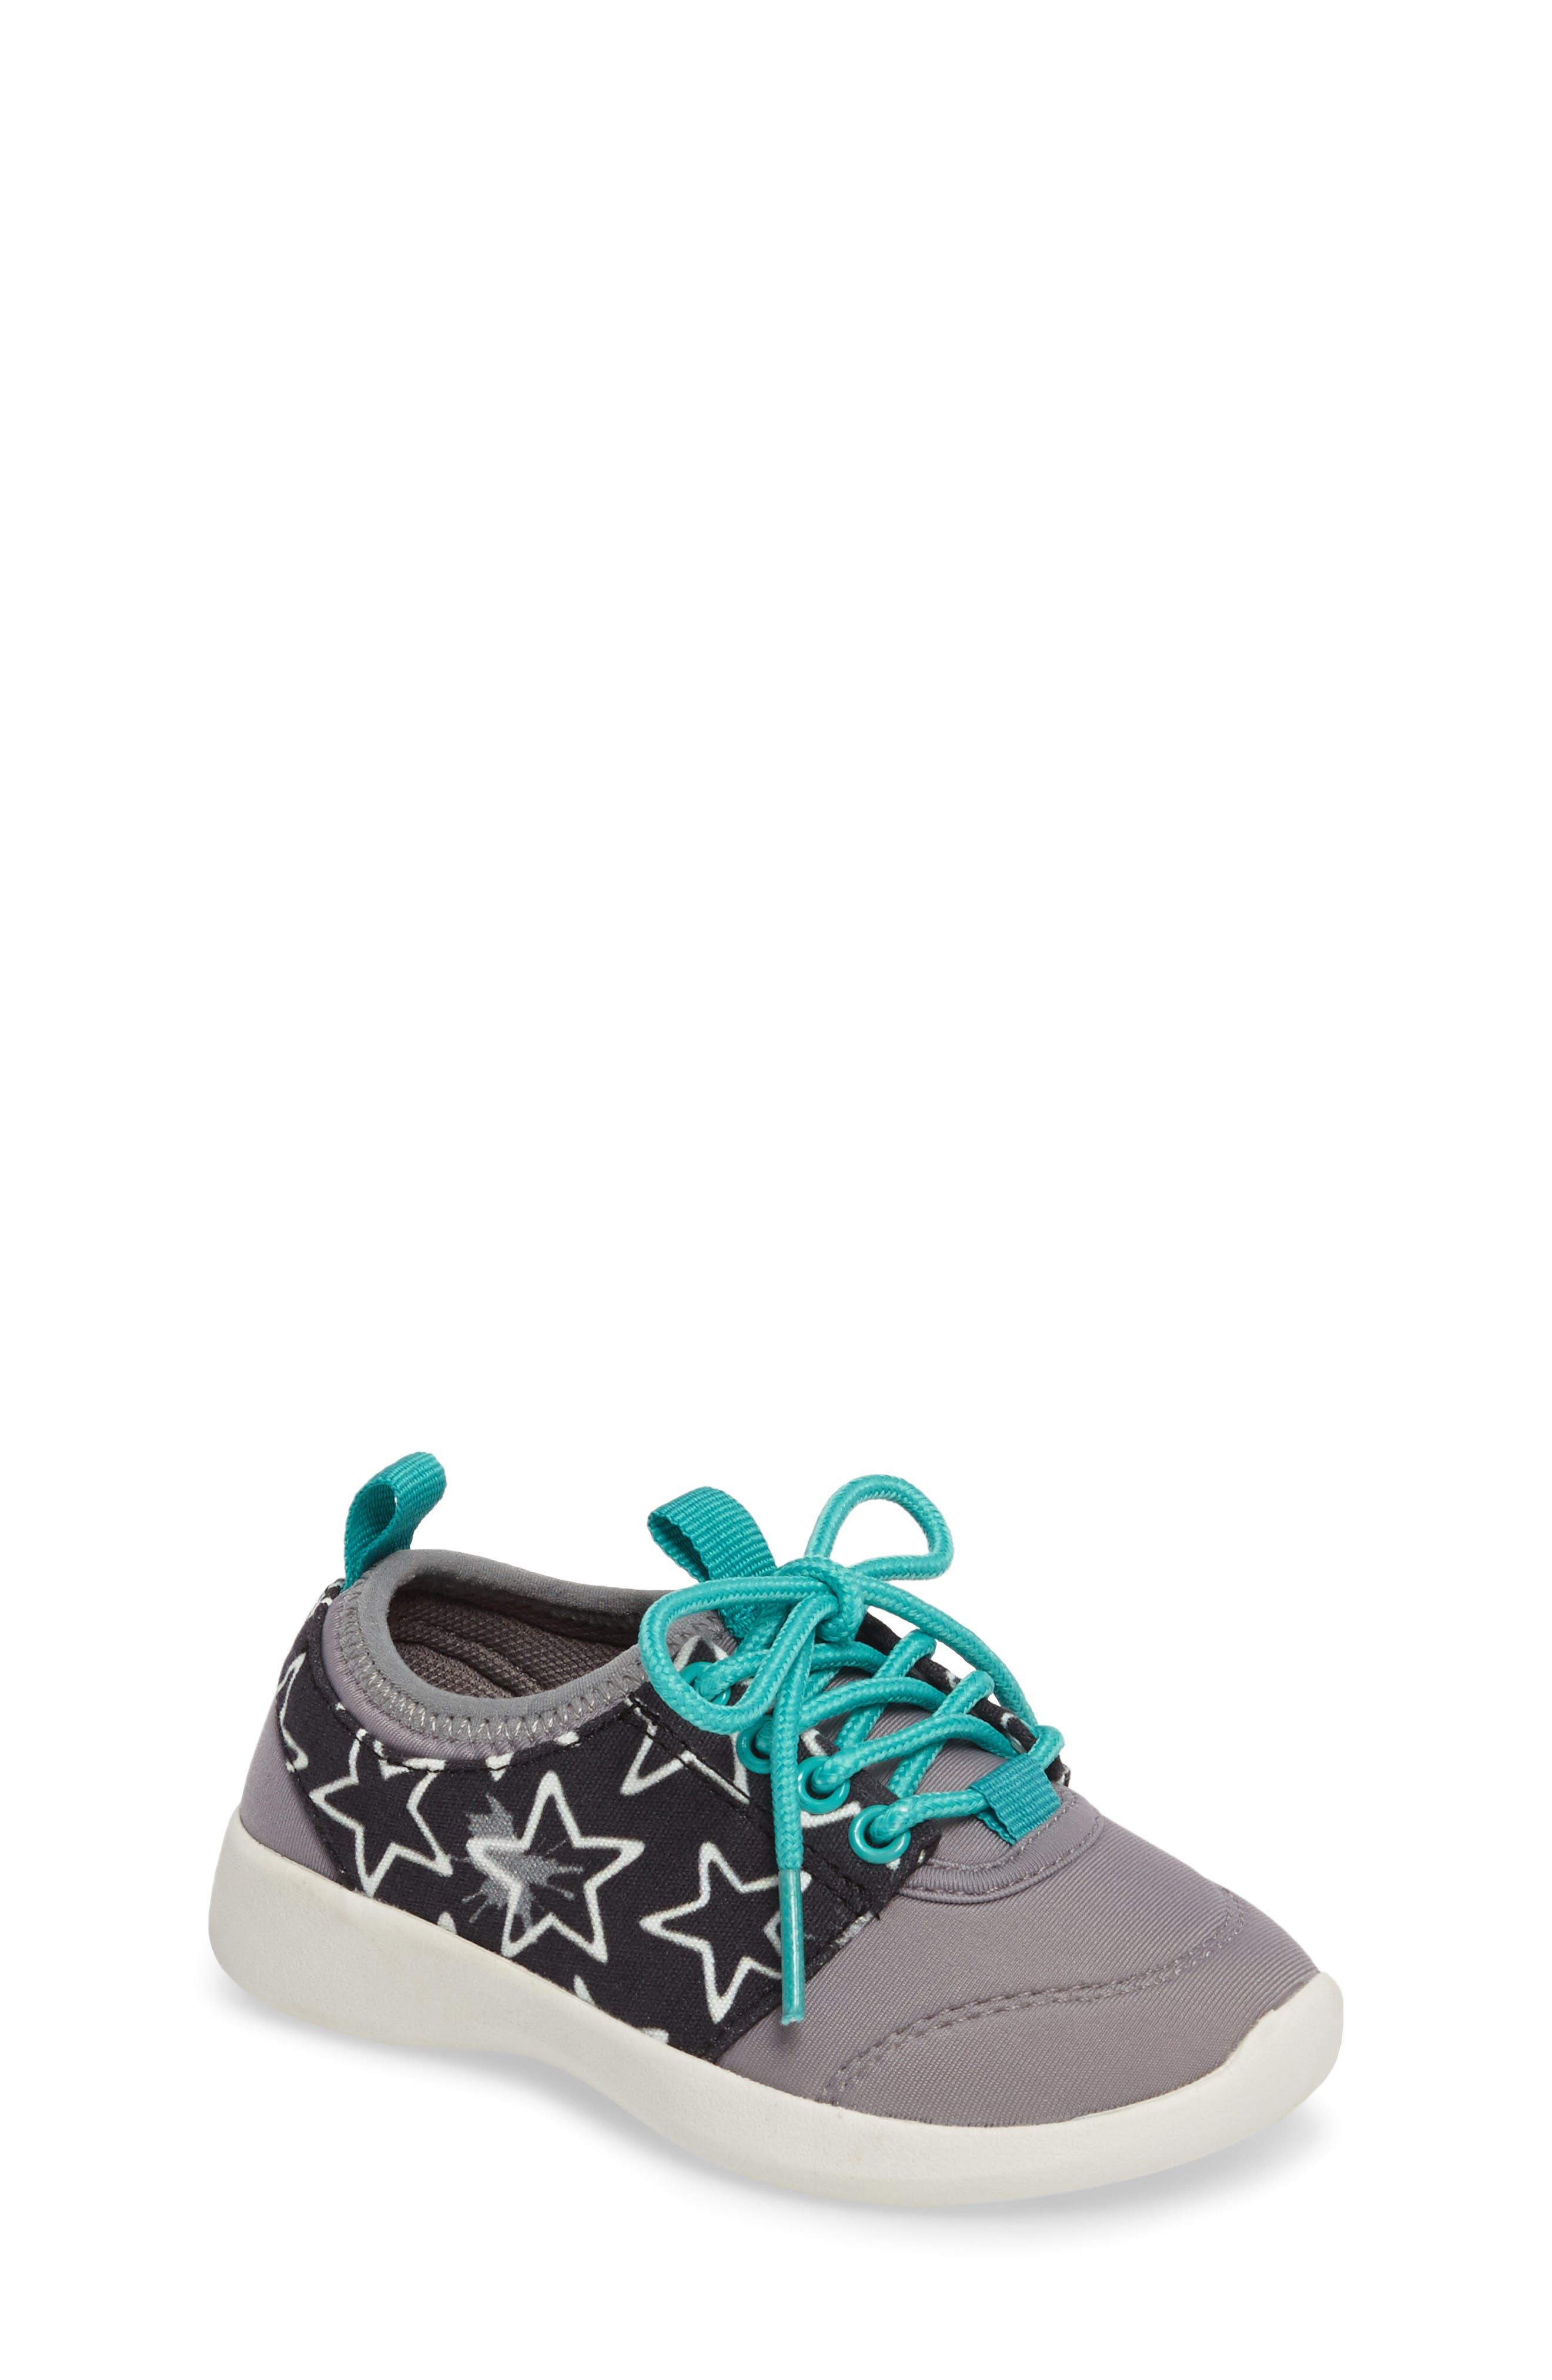 Bolt Sock-Fit Sneaker,                             Main thumbnail 1, color,                             001